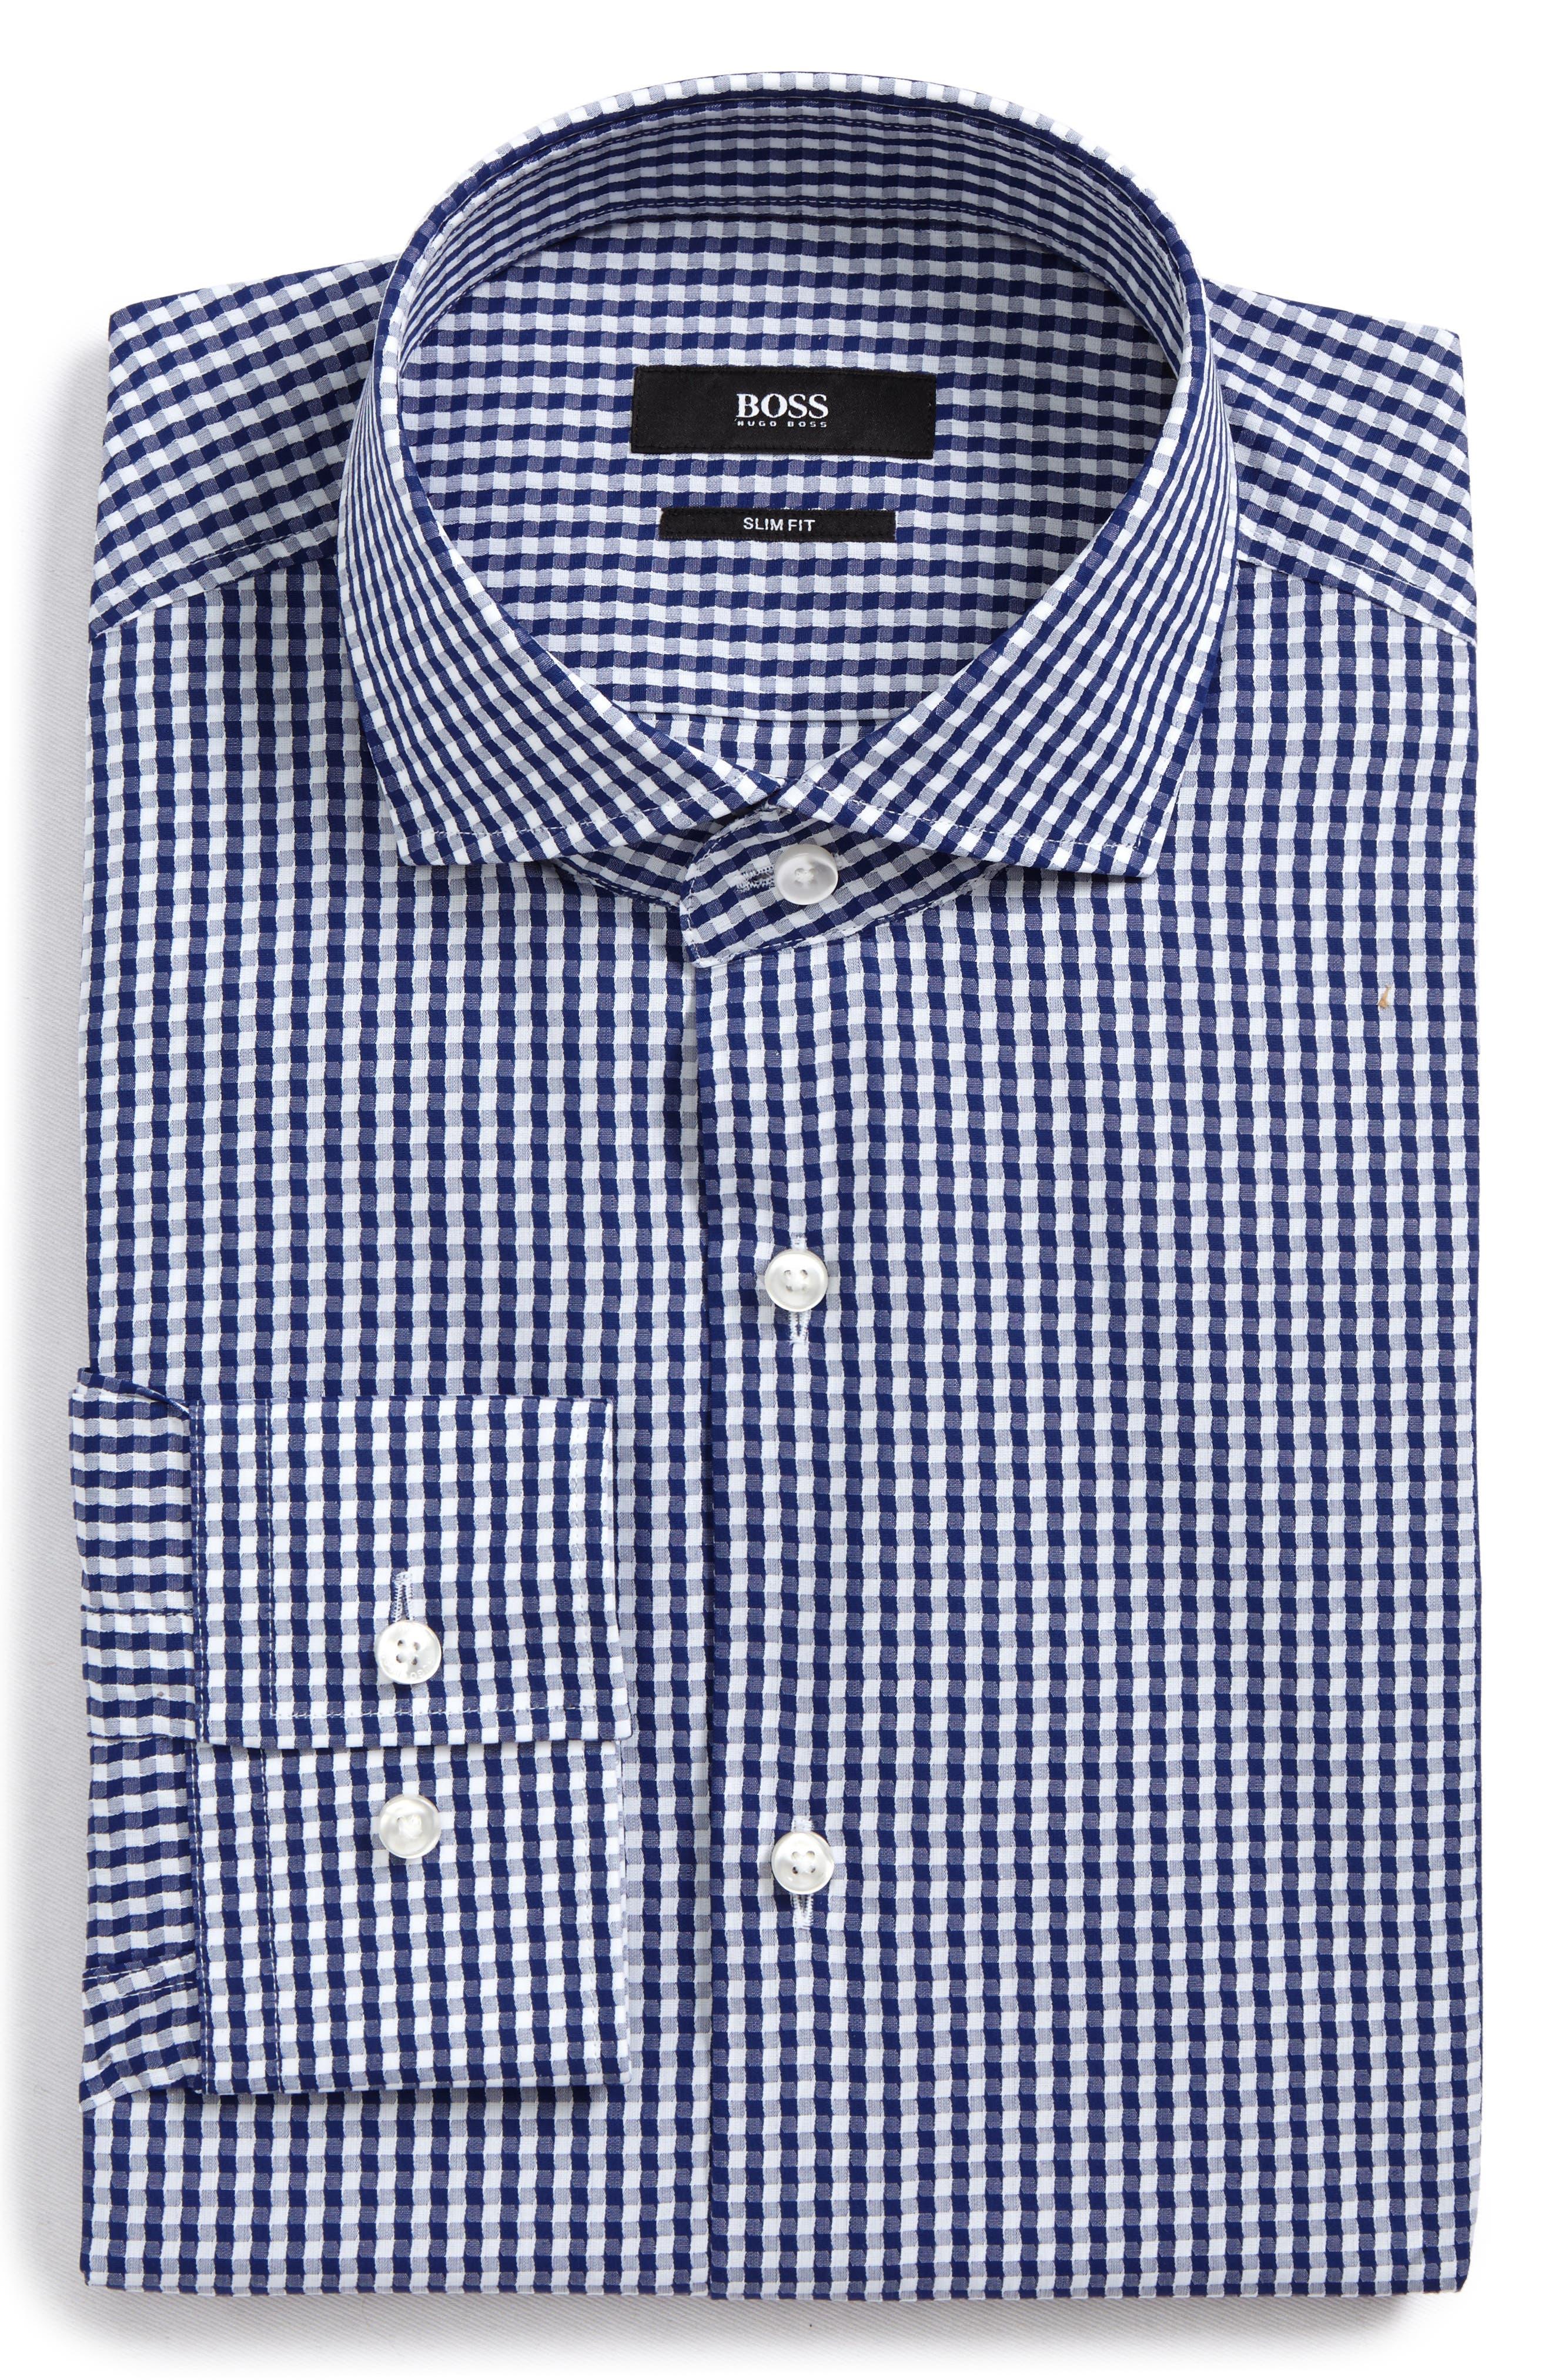 Alternate Image 1 Selected - BOSS Jason Slim Fit Check Dress Shirt